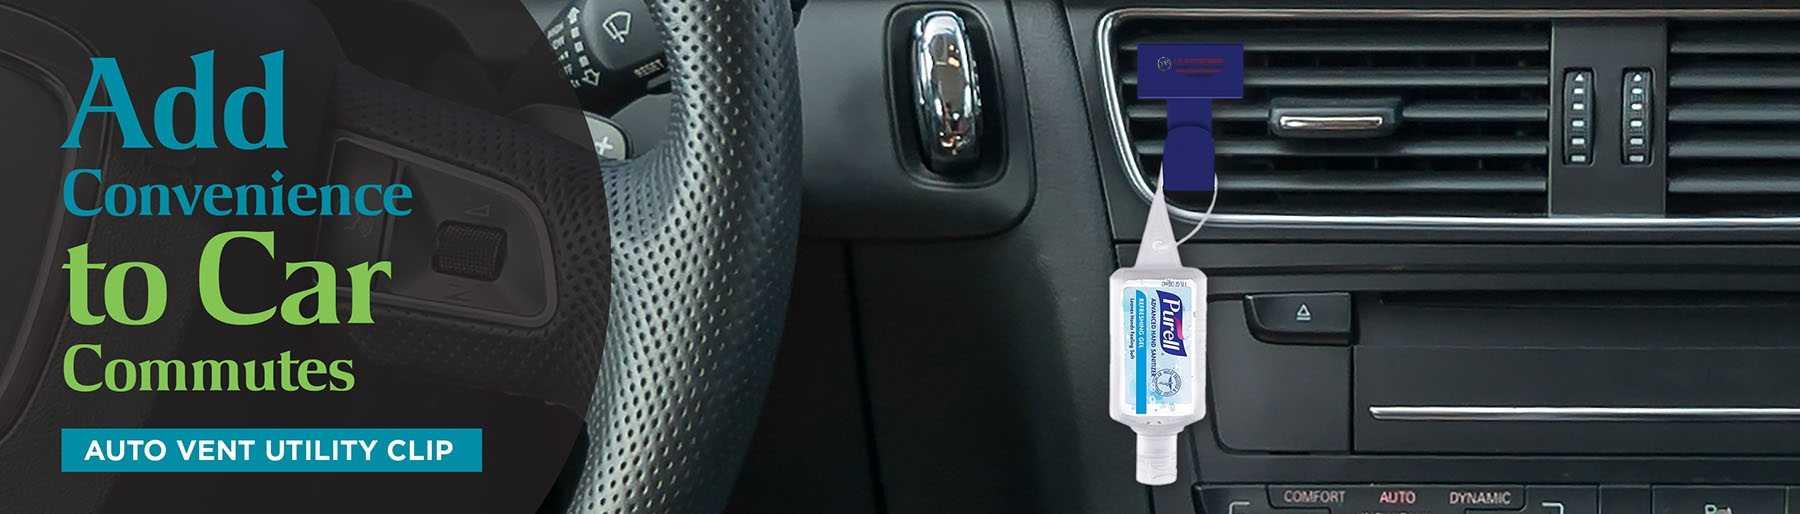 Auto Vent Utility Clip AIM